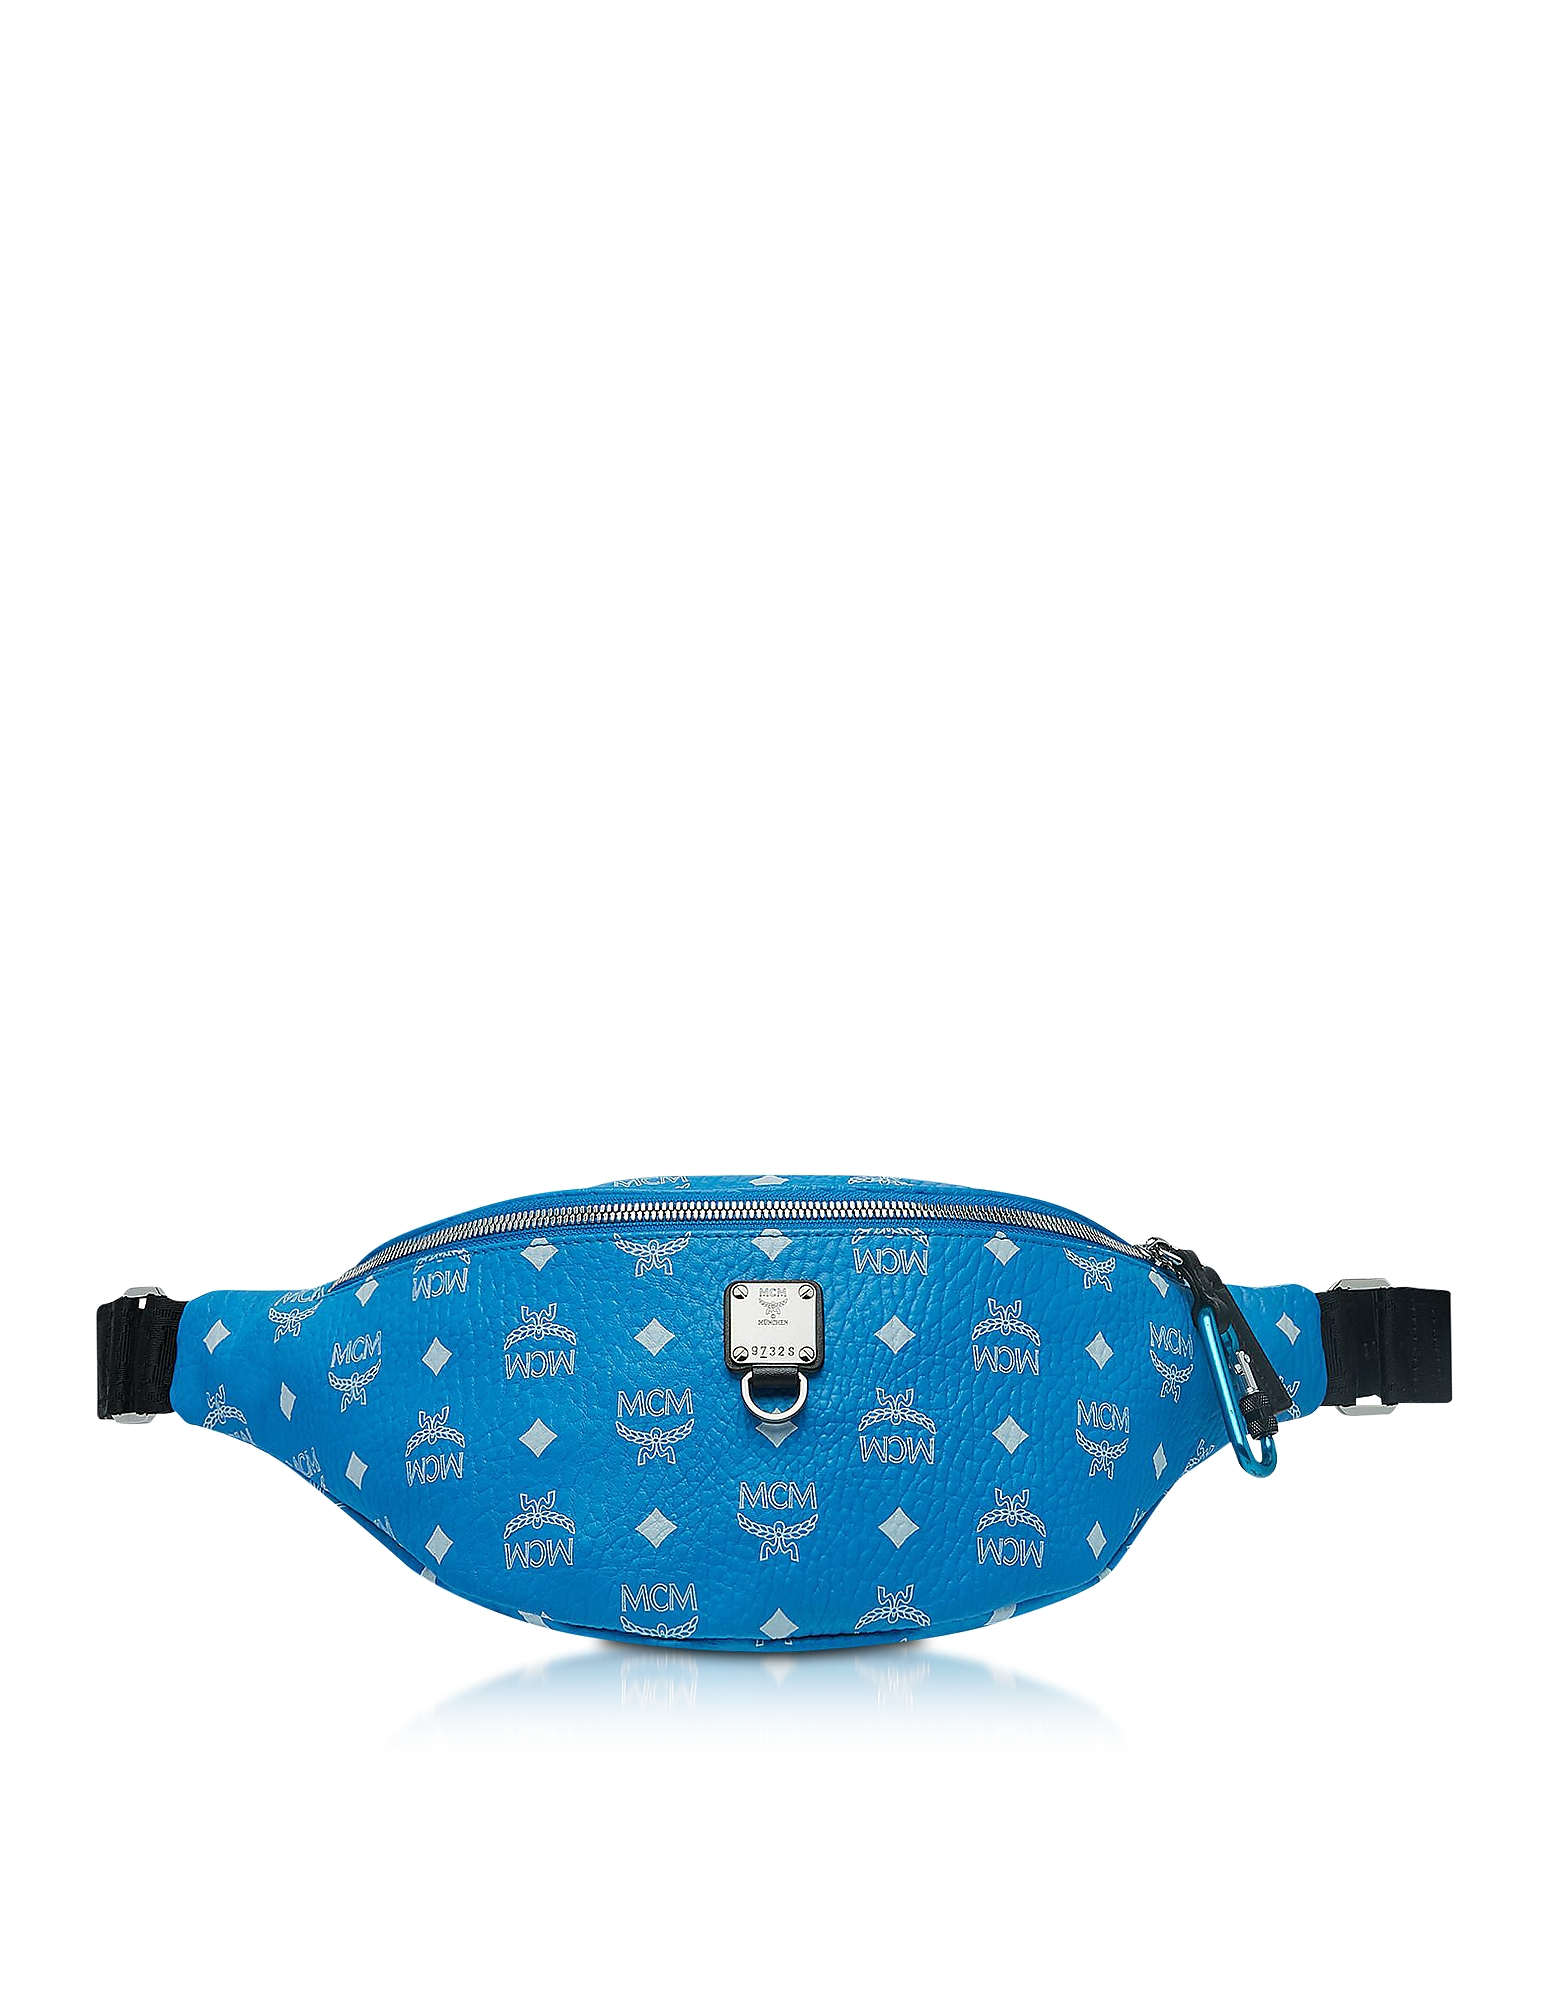 Blue Fursten Belt Bag w/White Logo Visetos